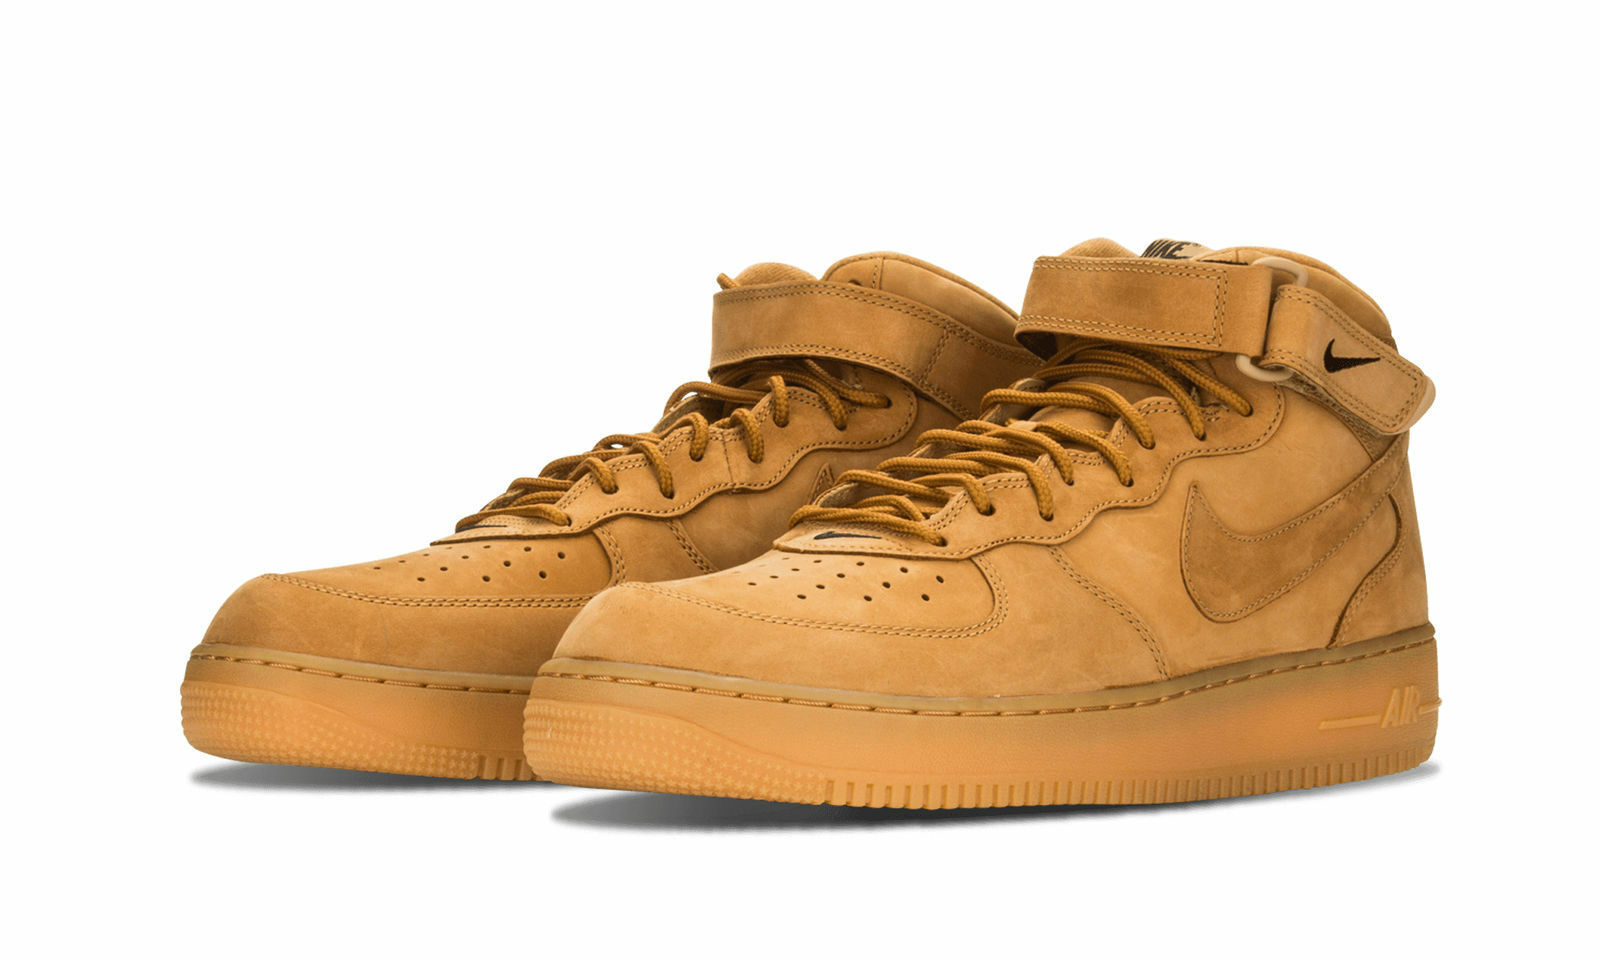 New Nike Air Force 1 Mid '07 PRM QS Flax Wheat Size 9.5 715889 200